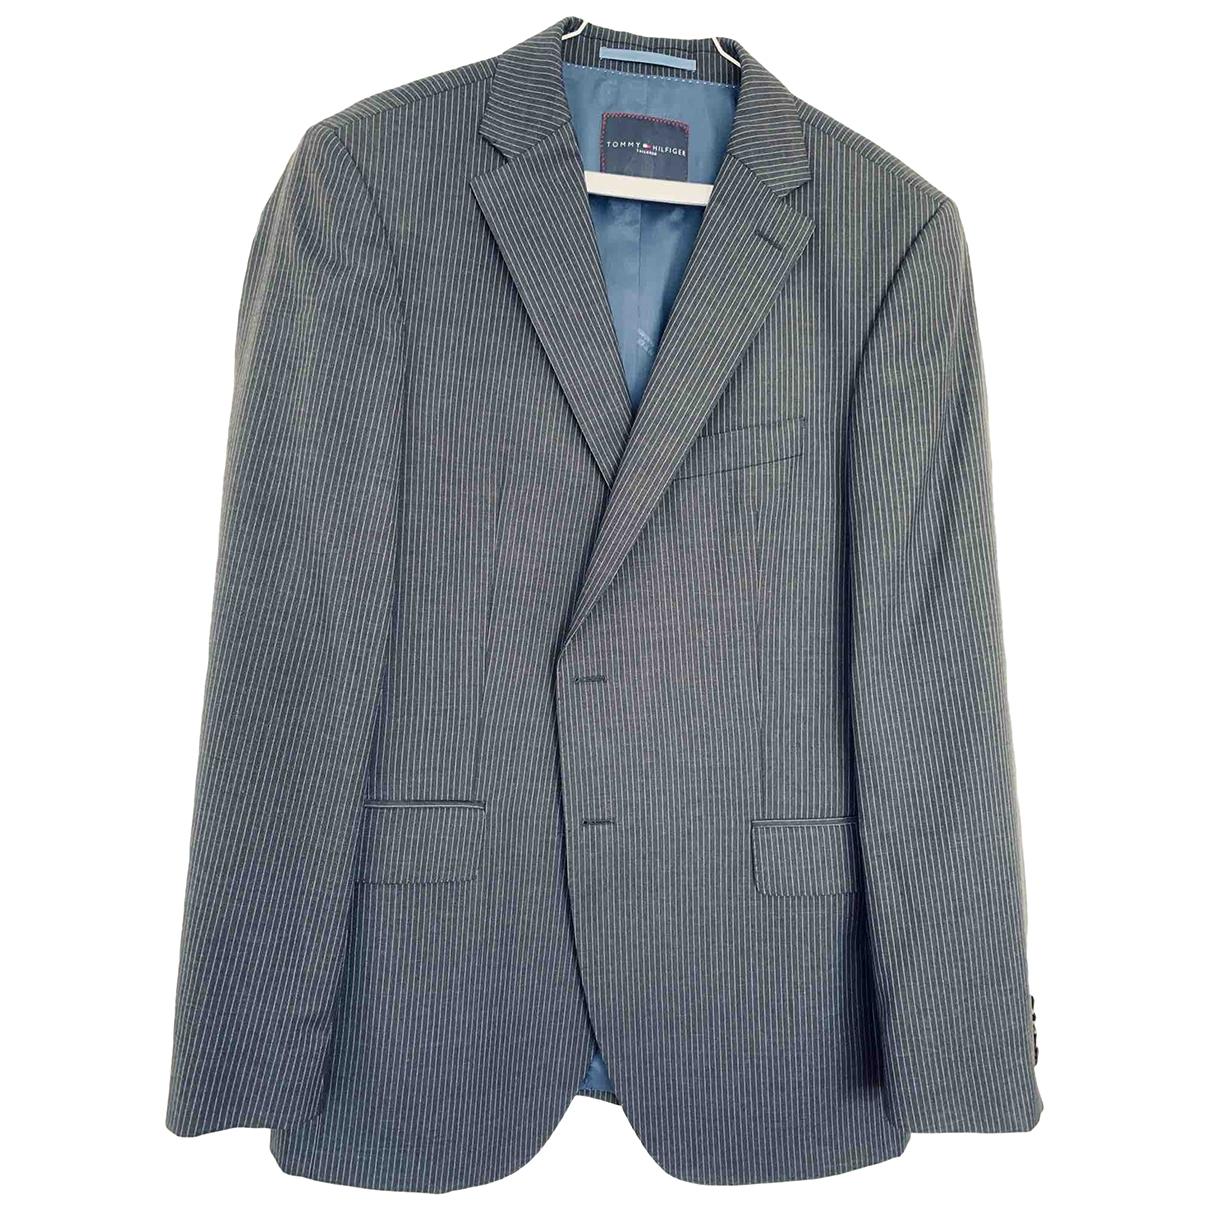 Tommy Hilfiger \N Grey Wool Suits for Men M International